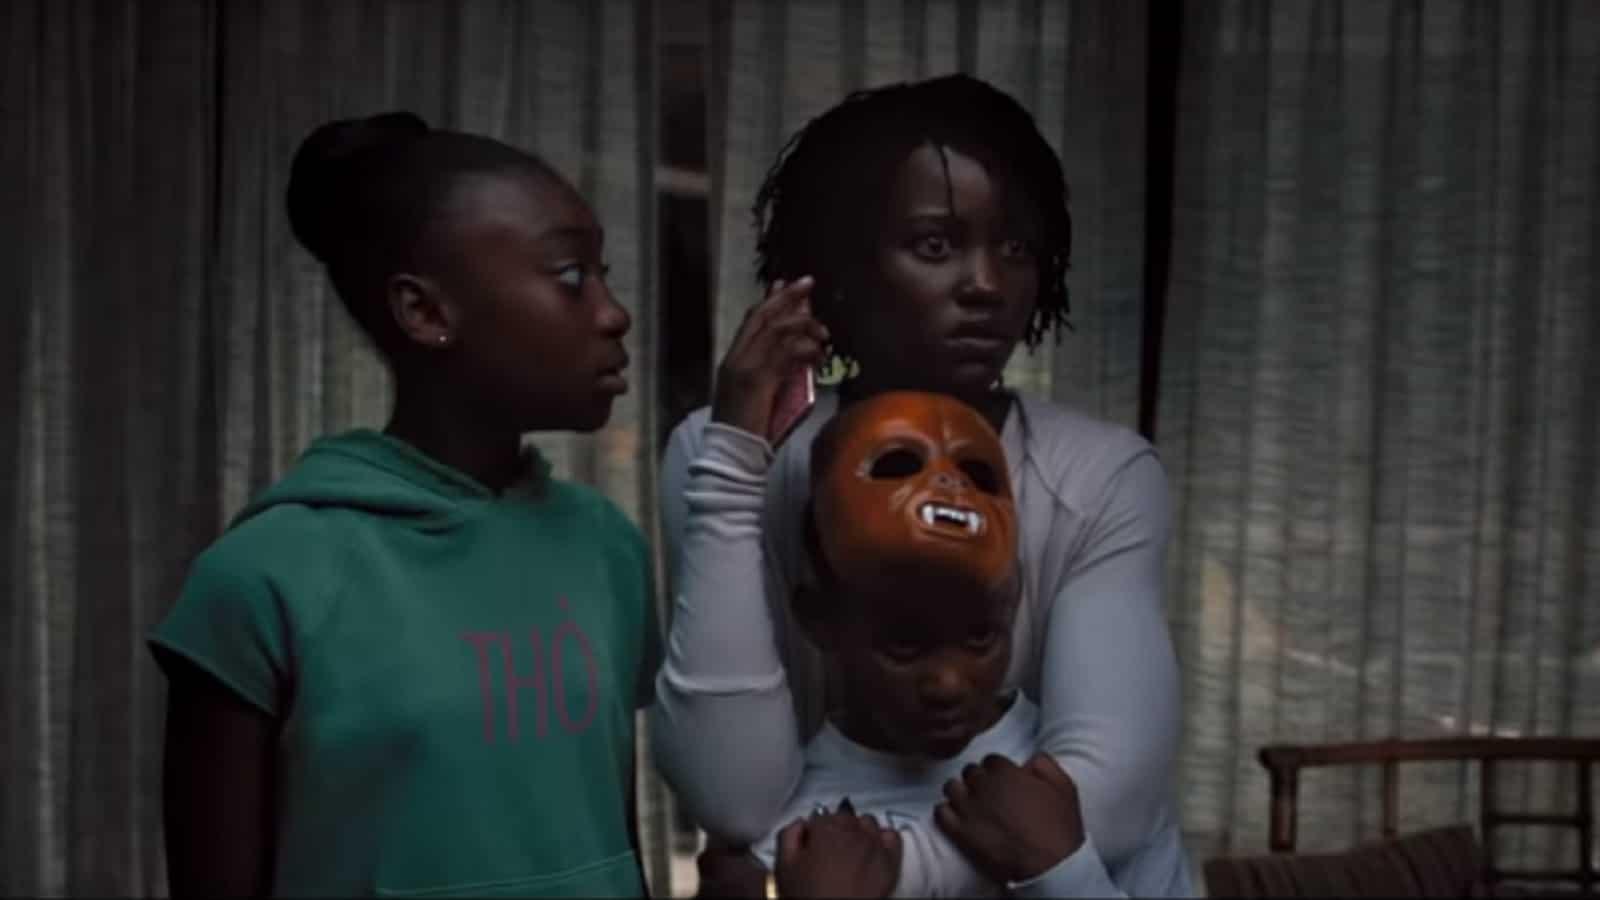 Jordan Peele Finally Shares a Creepy Trailer for 'Us'